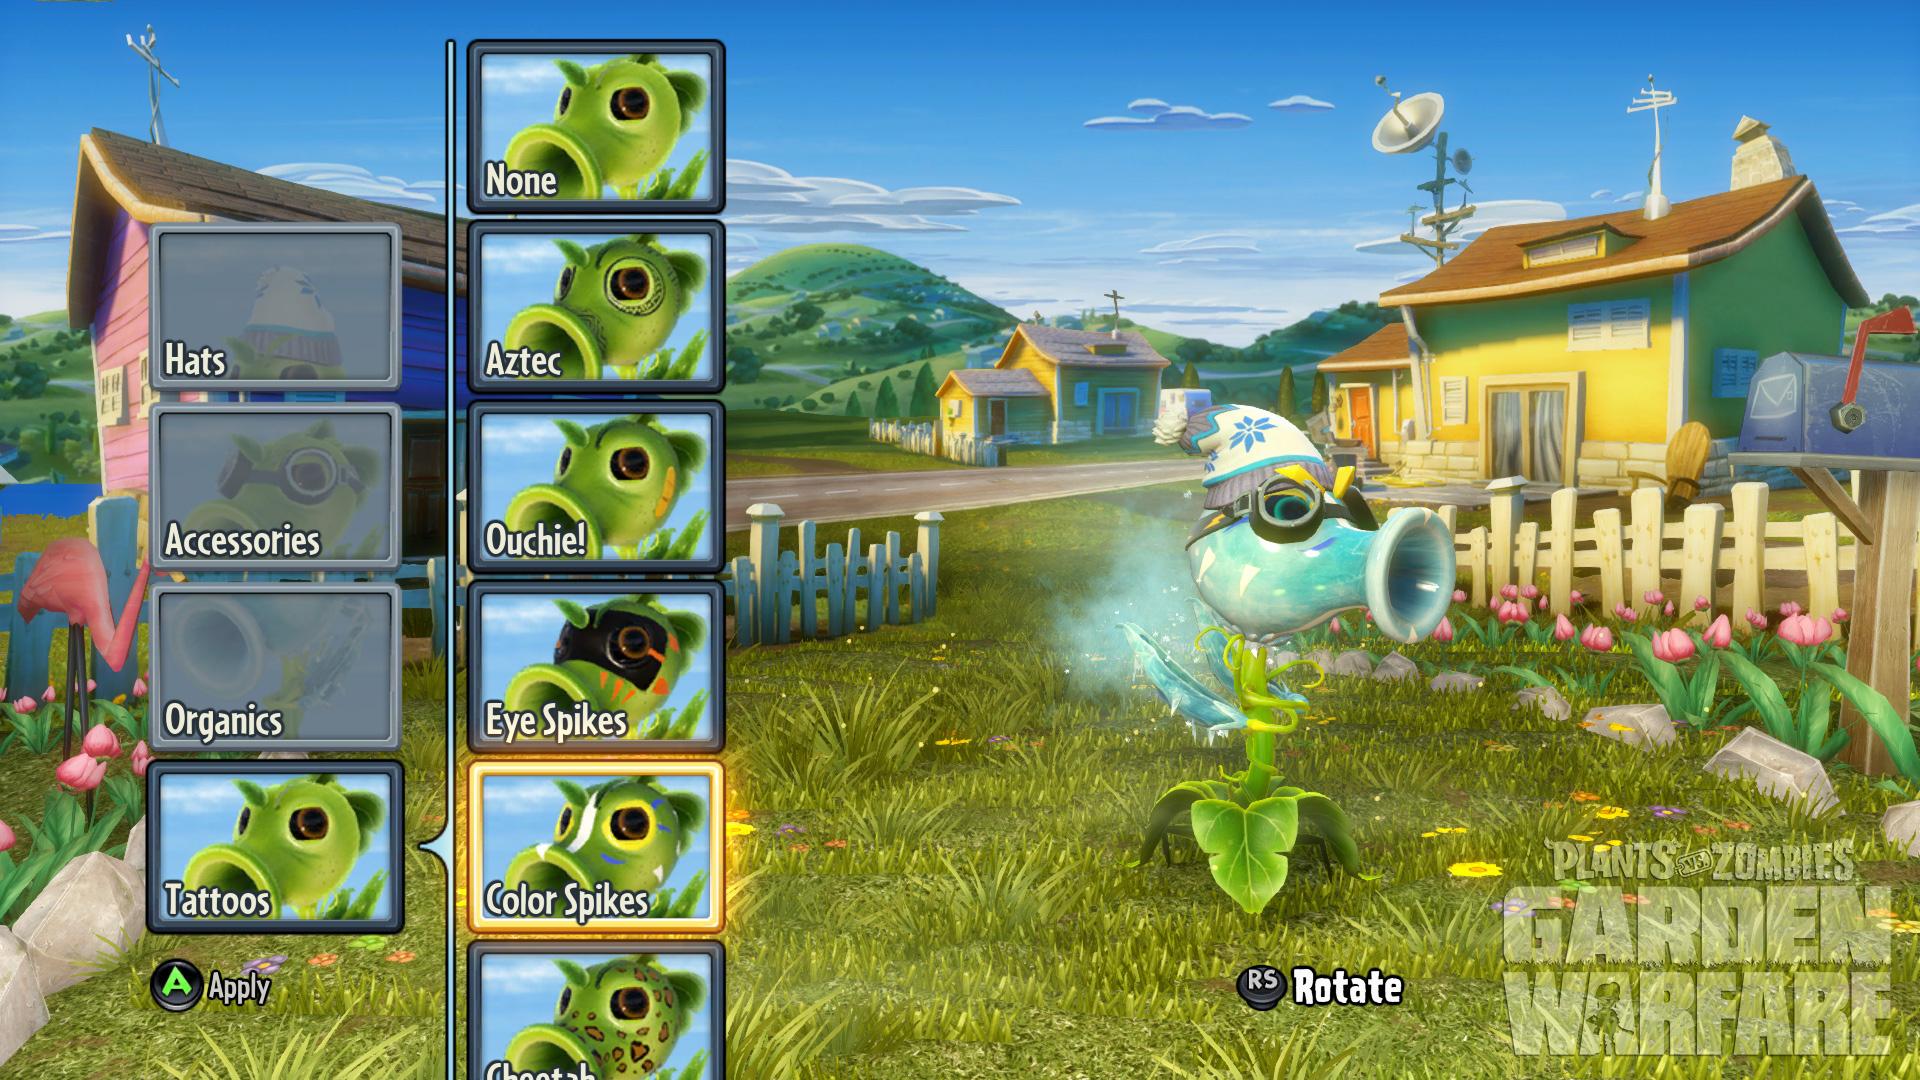 Plants vs Zombies Garden Warfare Update Freezes Consoles and Nerfs ...